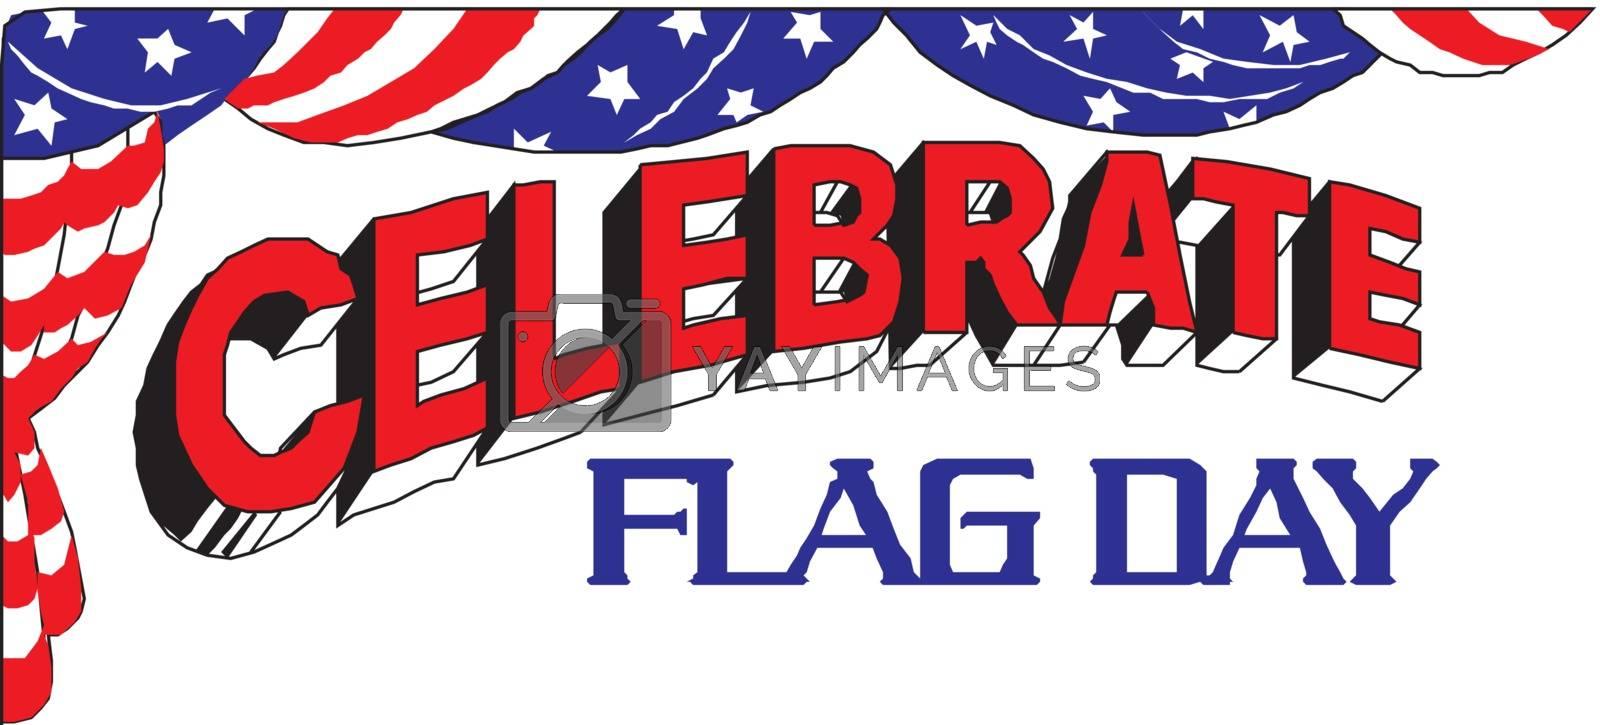 Celebrate Flag Day by yurka